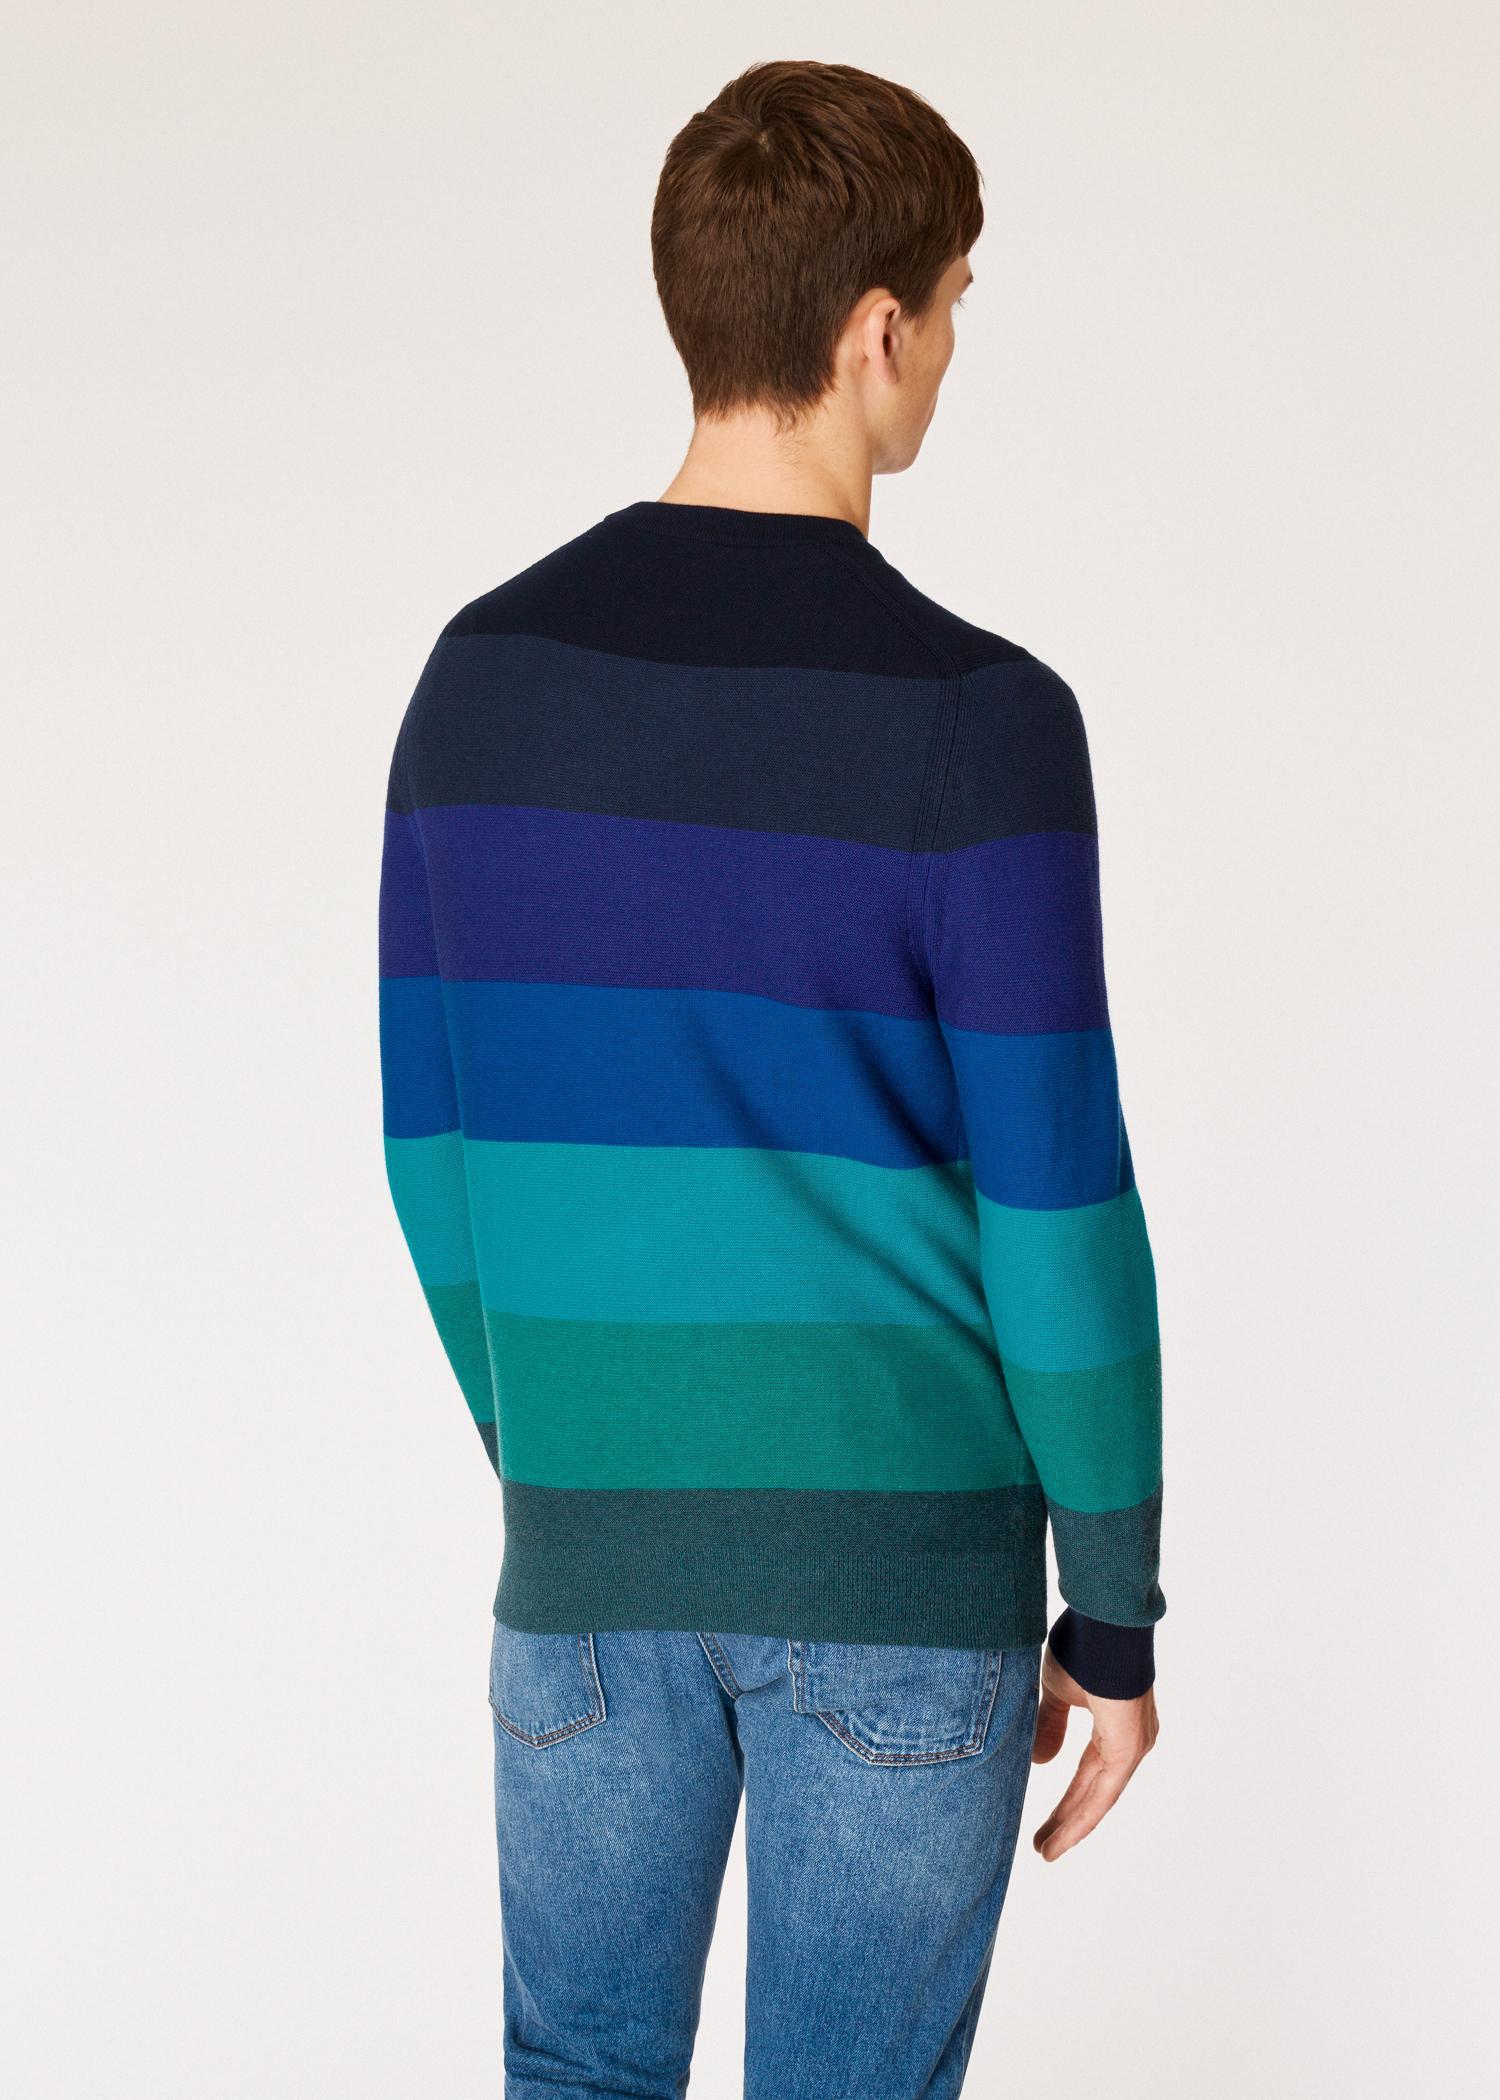 d6f78cd867391 ... Blue Tonal Stripe Crew Neck Wool-blend Sweater for Men - Lyst. View  fullscreen